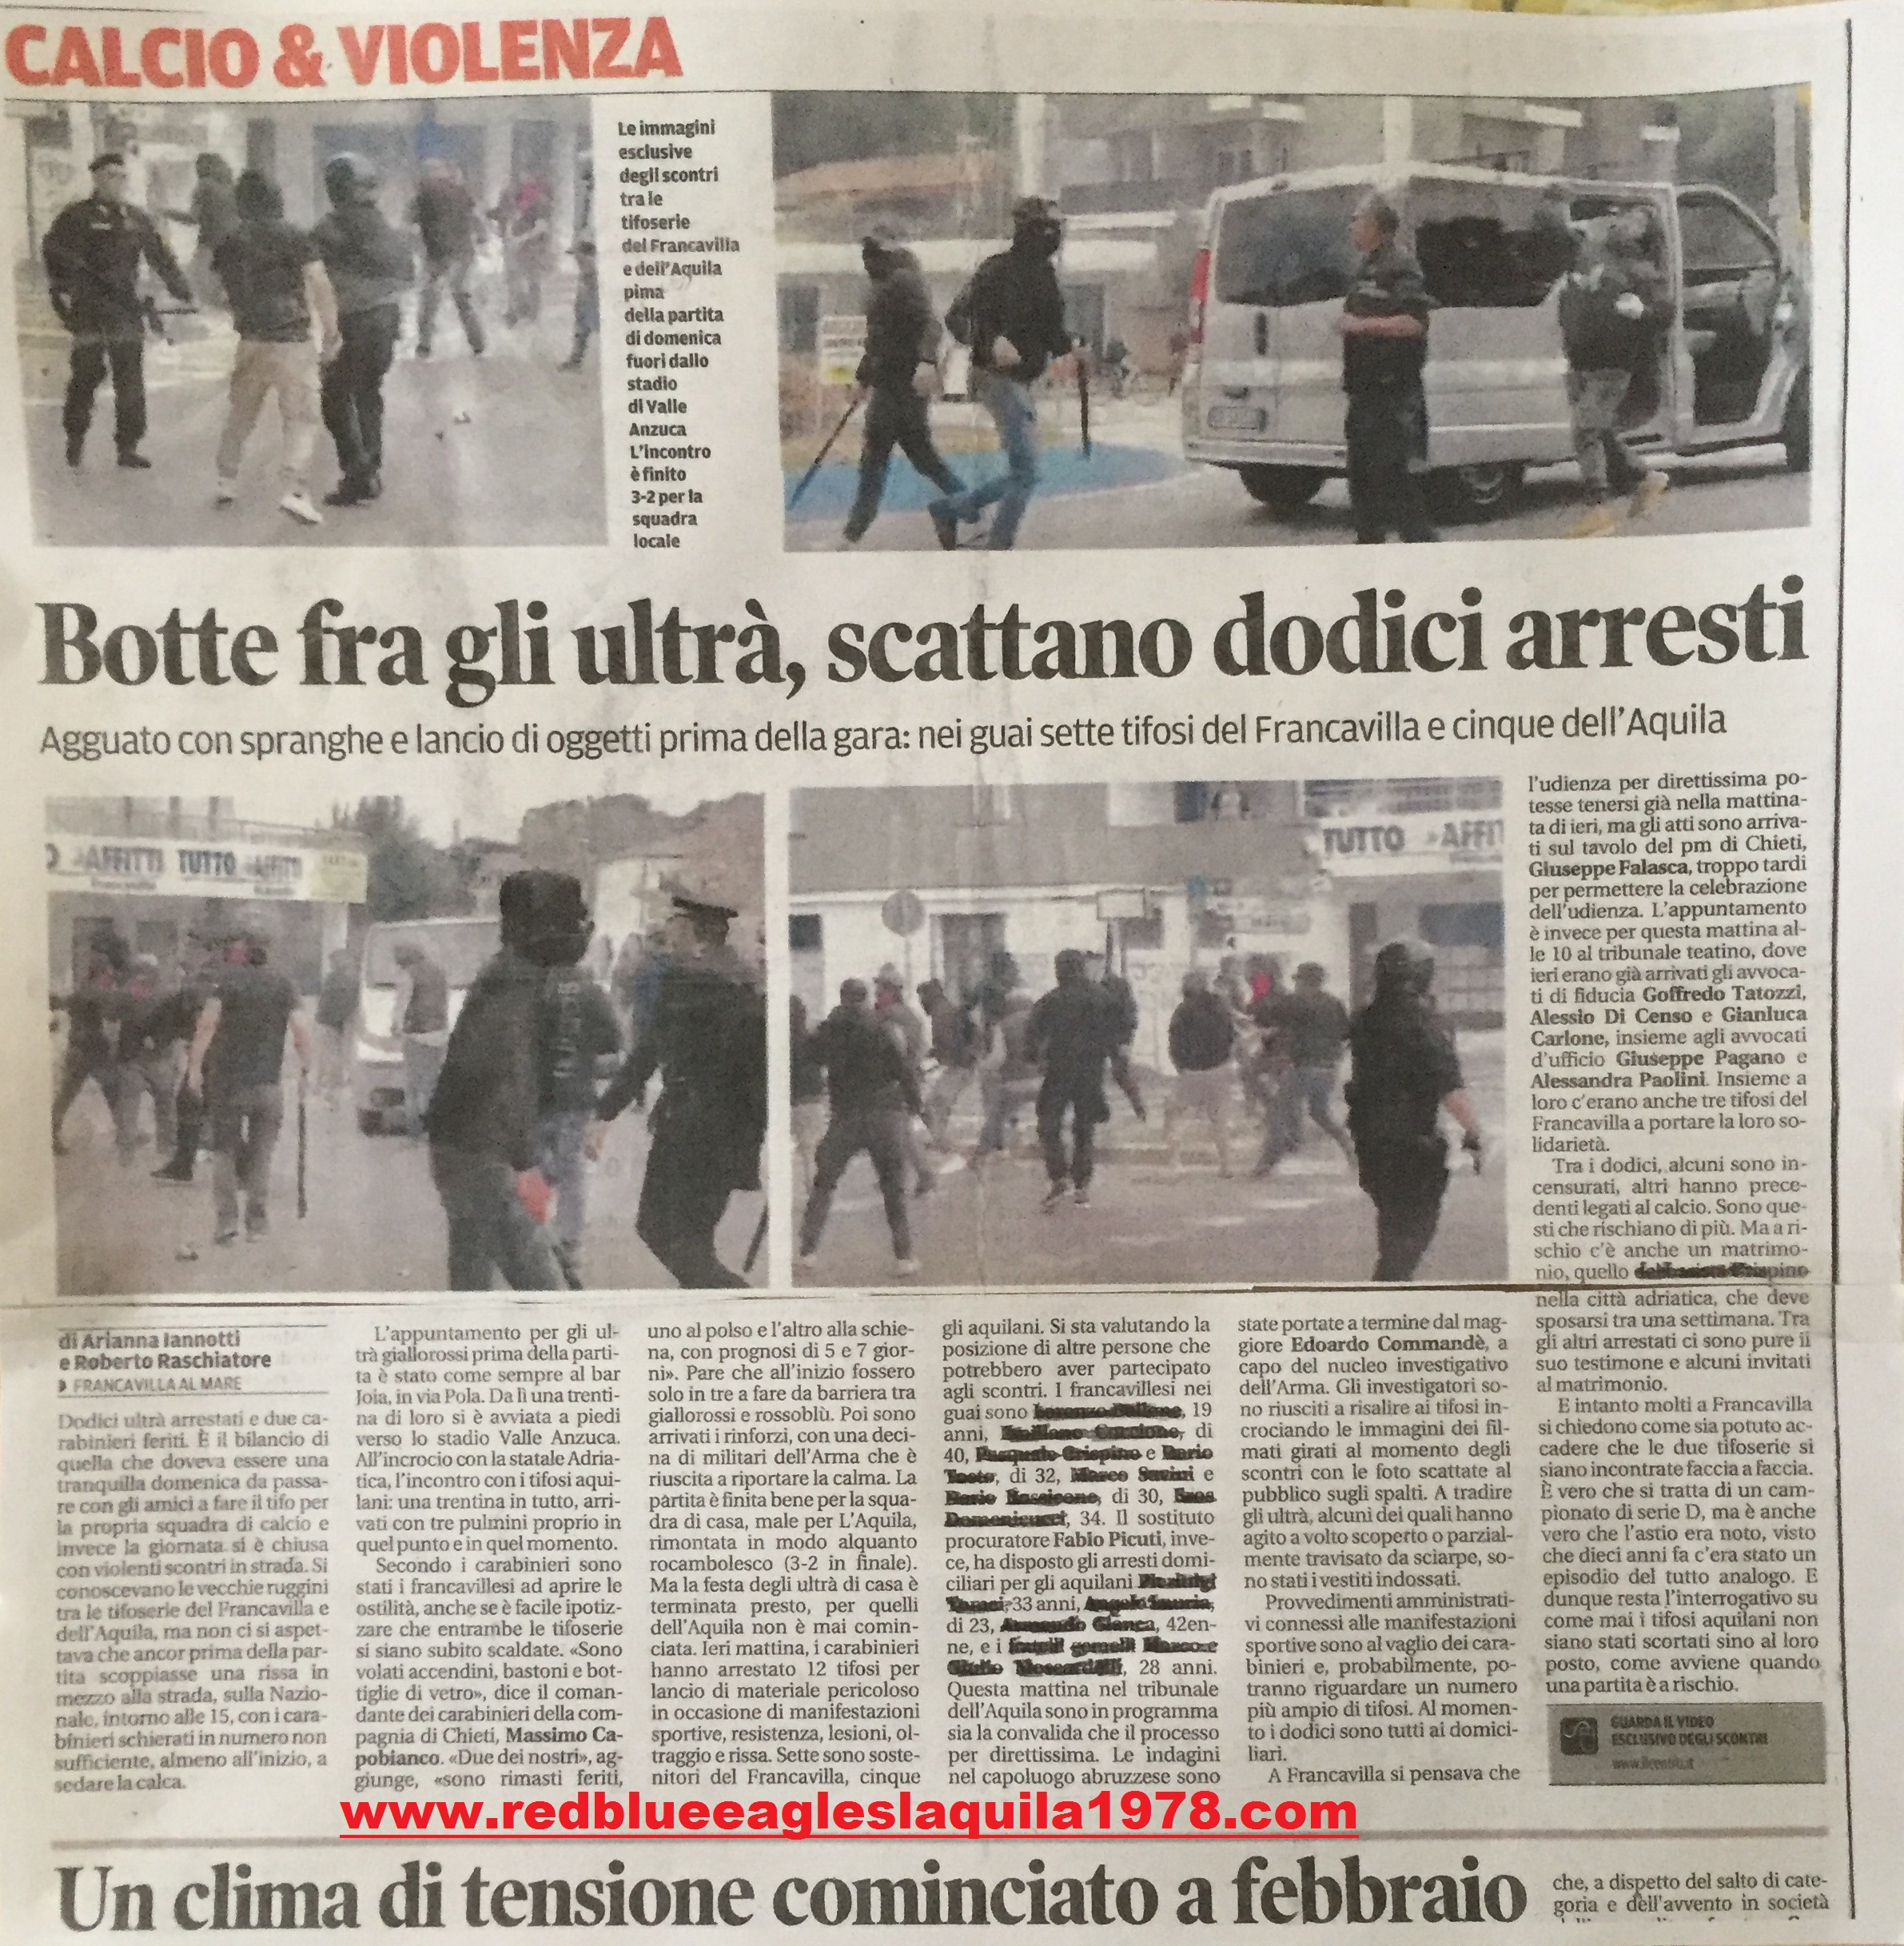 Scontri in strada Francavilla-L'Aquila (serie D) 22 Ottobre 2017